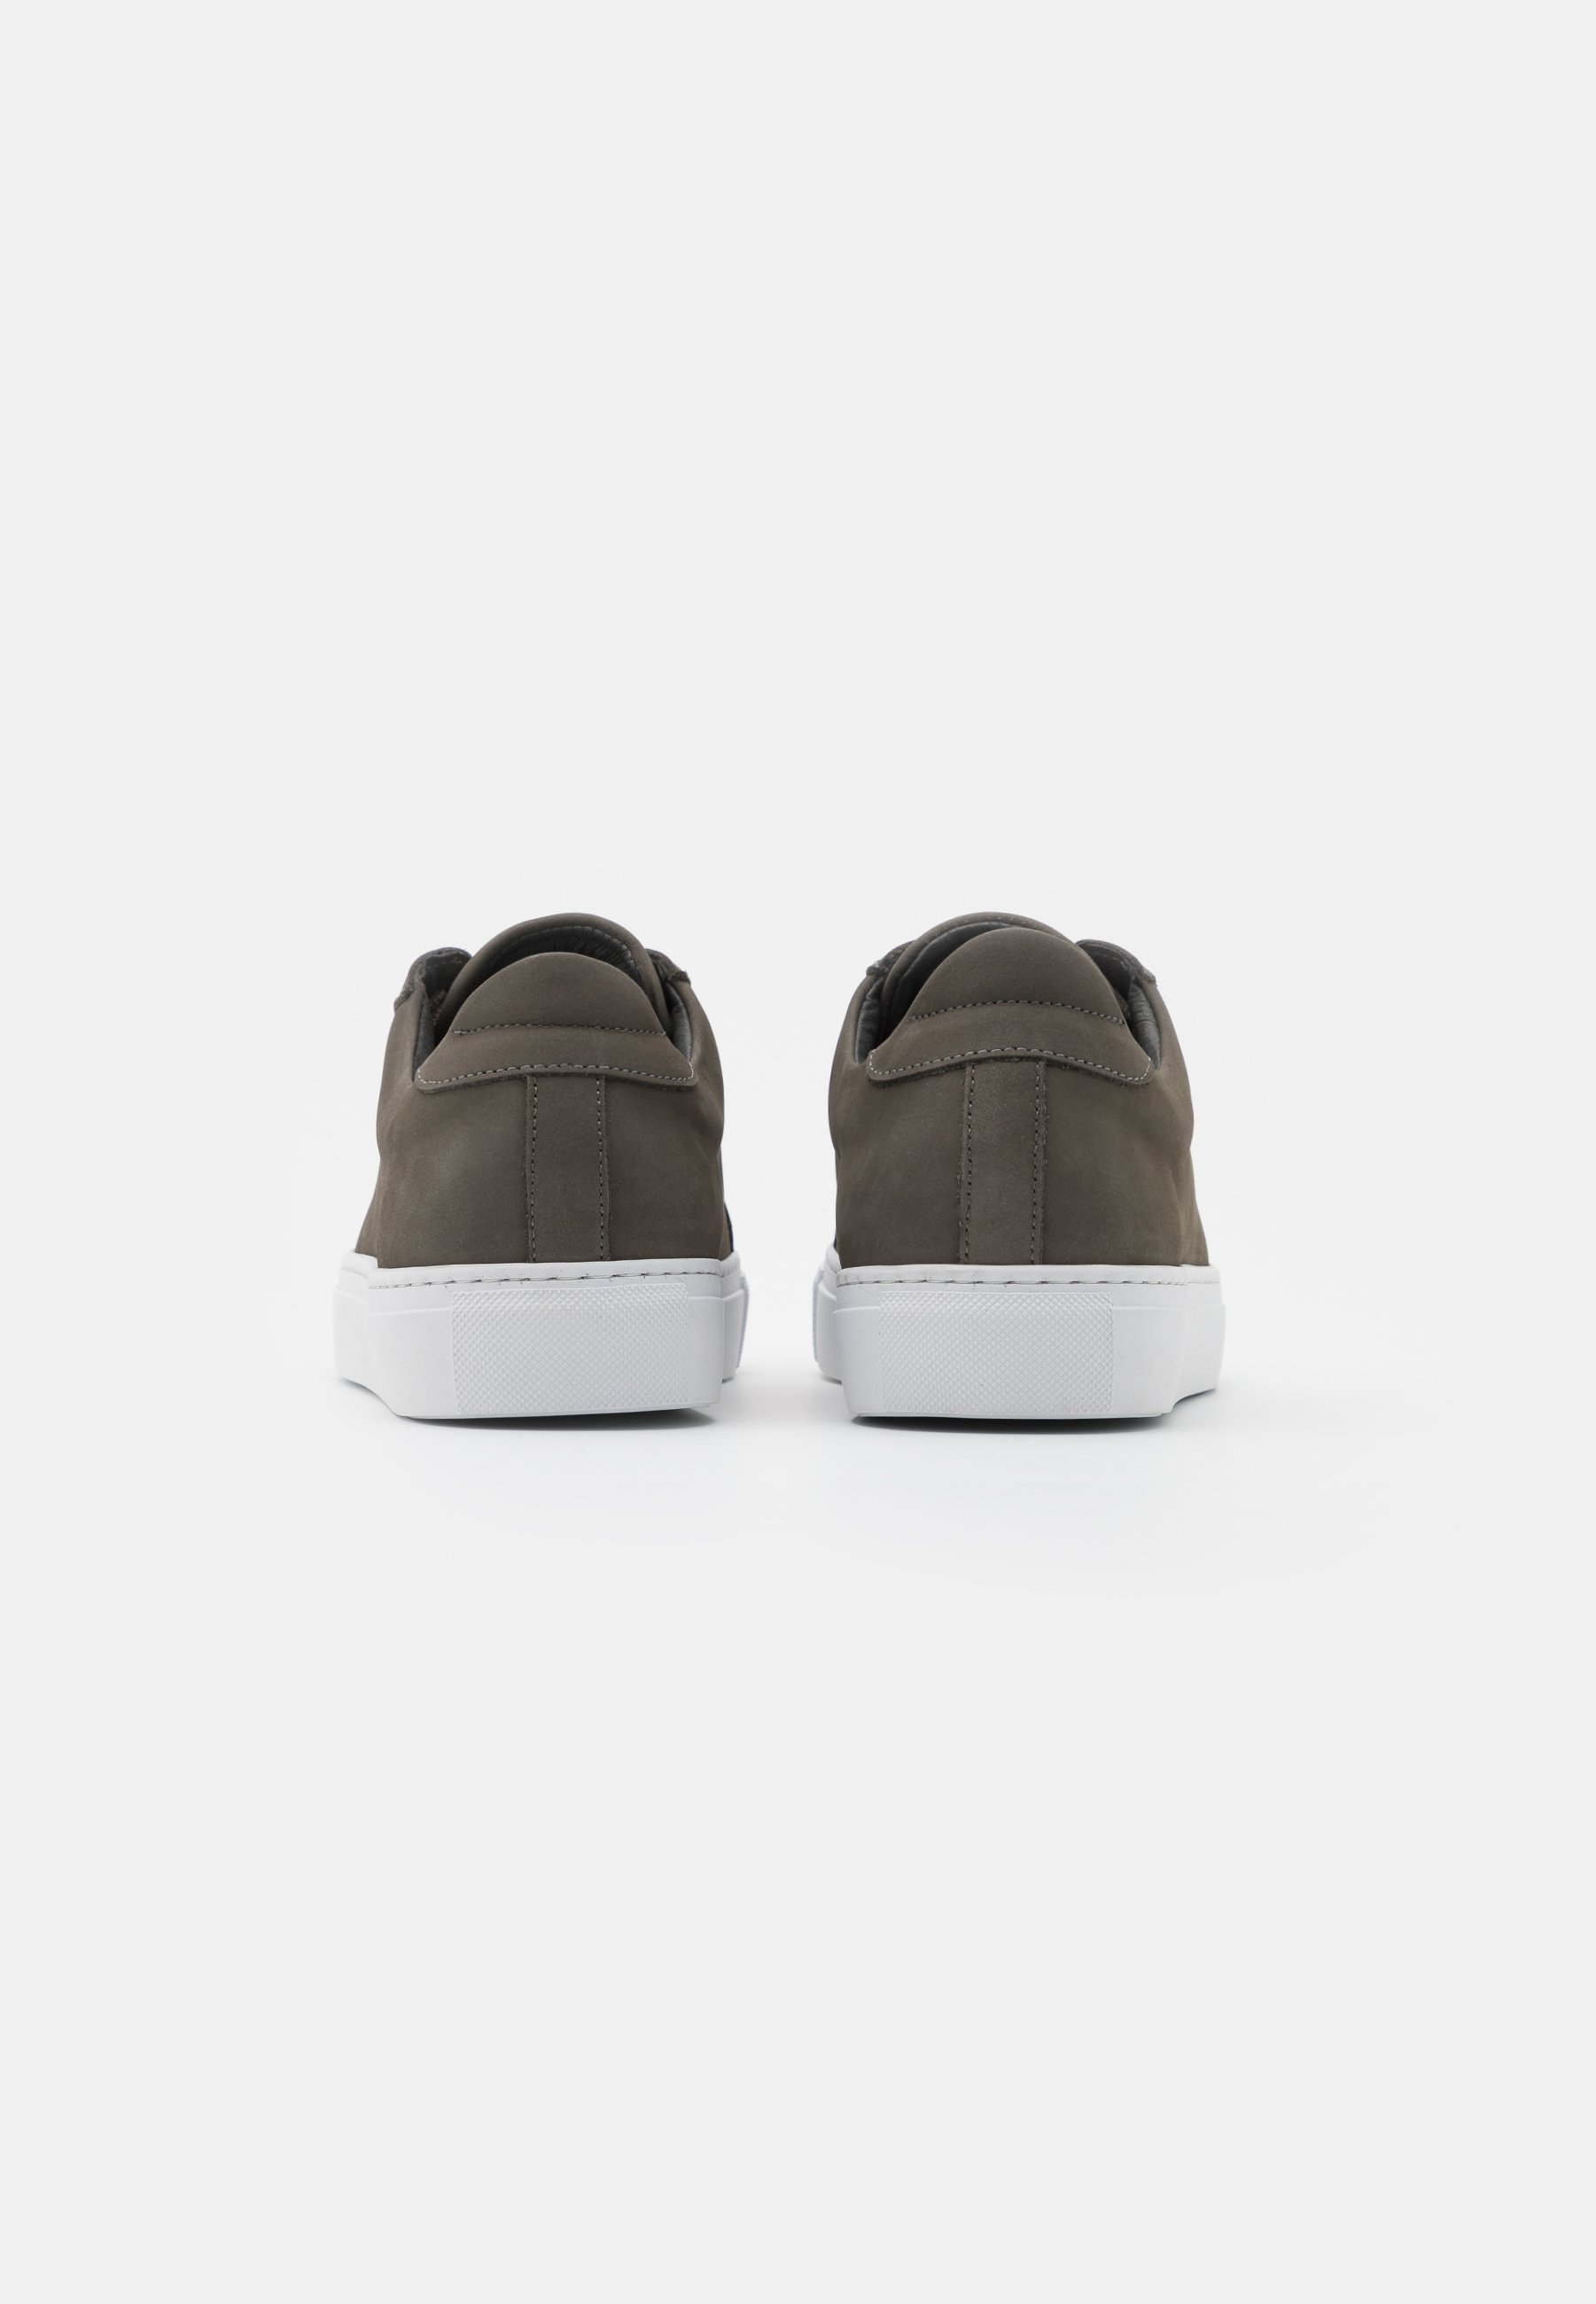 Online Cheapest Cheapest Men's Shoes GARMENT PROJECT TYPE  Trainers dark grey K2FMqpCj0 sxLCh8QZe